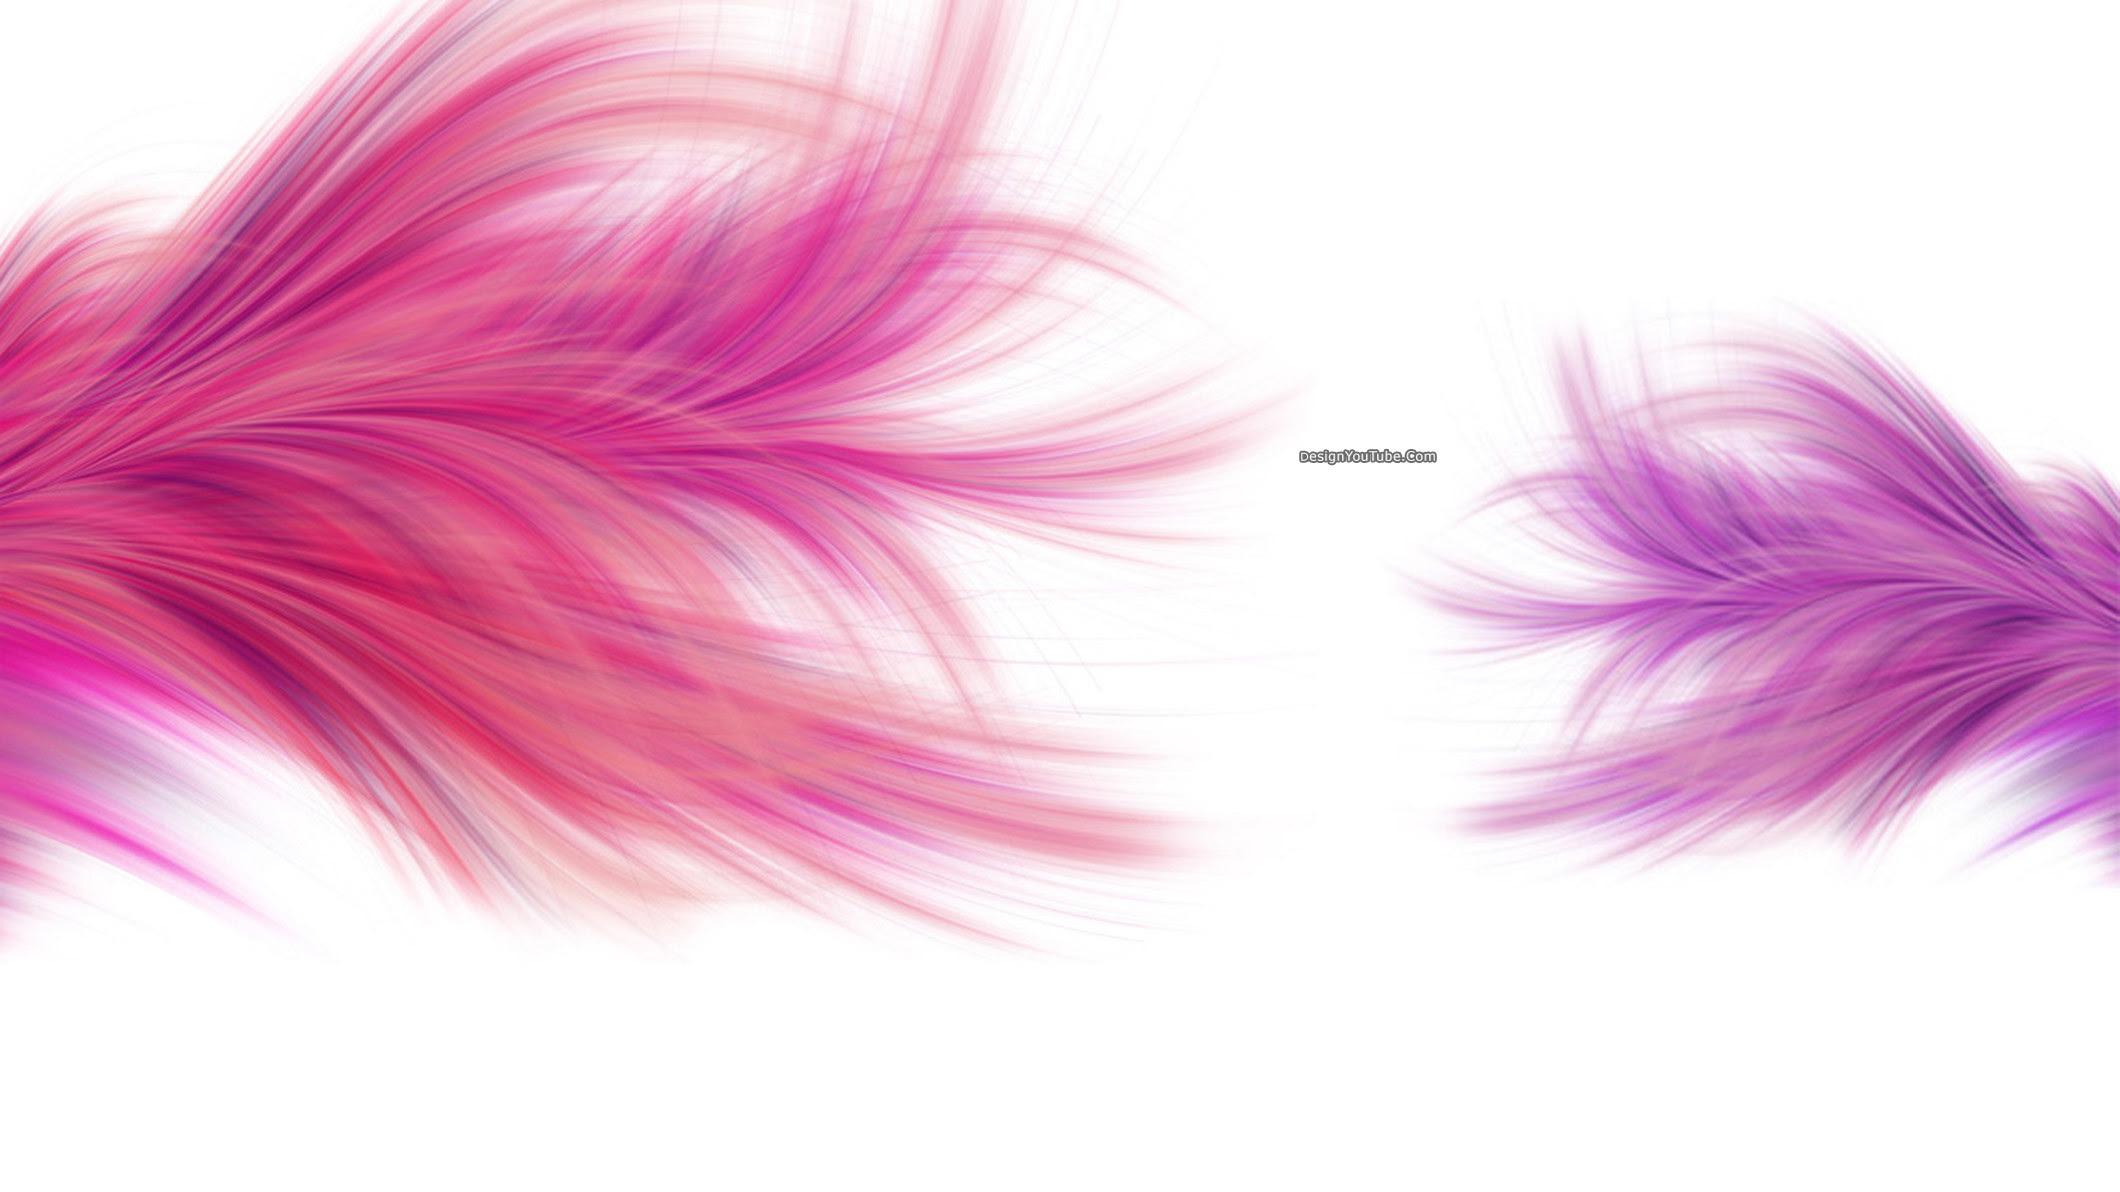 Unduh 6600 Background Banner Youtube Pink HD Gratis